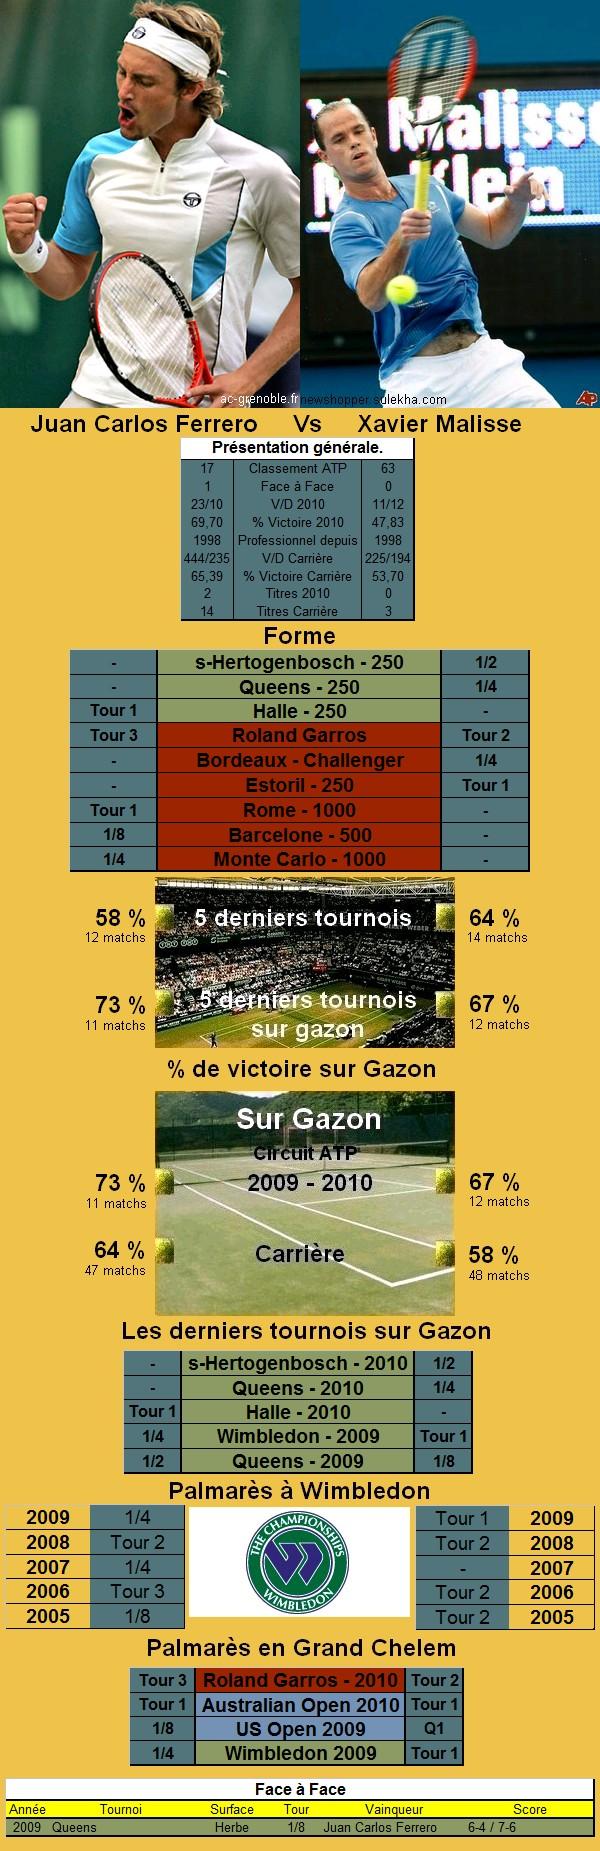 Statistiques tennis de Ferrero contre Malisse à Wimbledon